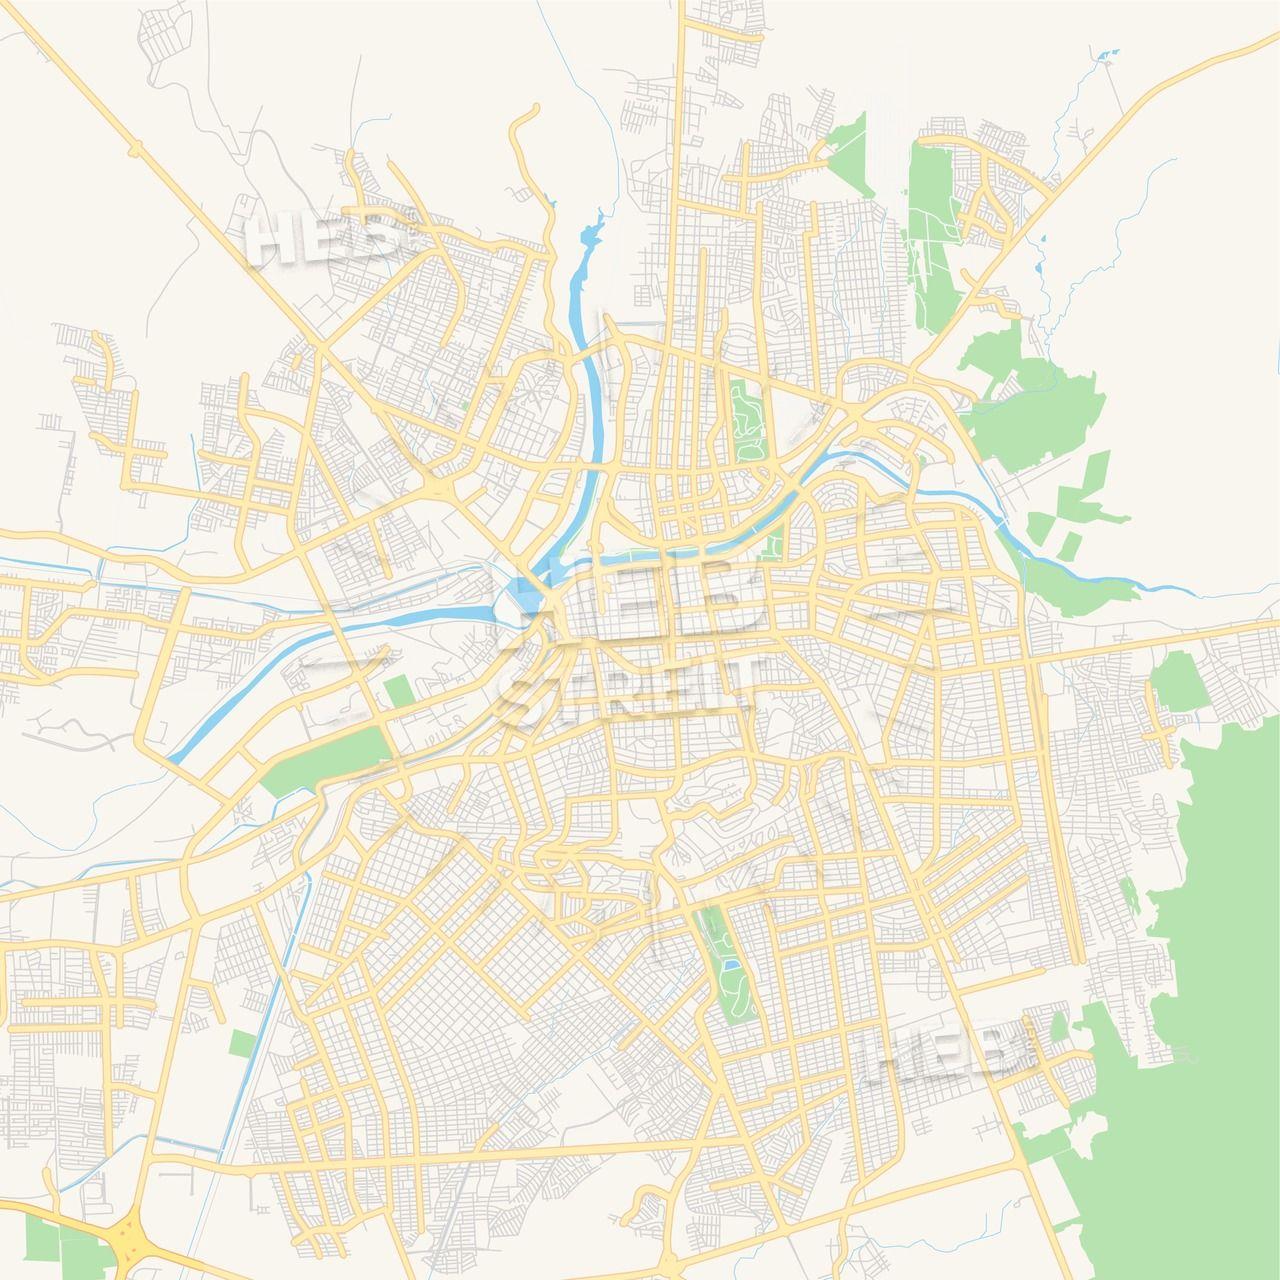 Empty vector map of Culiacán, Sinaloa, Mexico   Maps Vector ... on durango map, zacatecas map, guanajuato map, jalisco map, nayarit map, fuerte river map, aguascalientes map, tlaxcala map, nueva esparta map, badiraguato map, tabasco map, mexico map, tamaulipas map, hidalgo map, morelos map, michoacan map, culiacan map, pitiquito map, norte map, zambezia map,